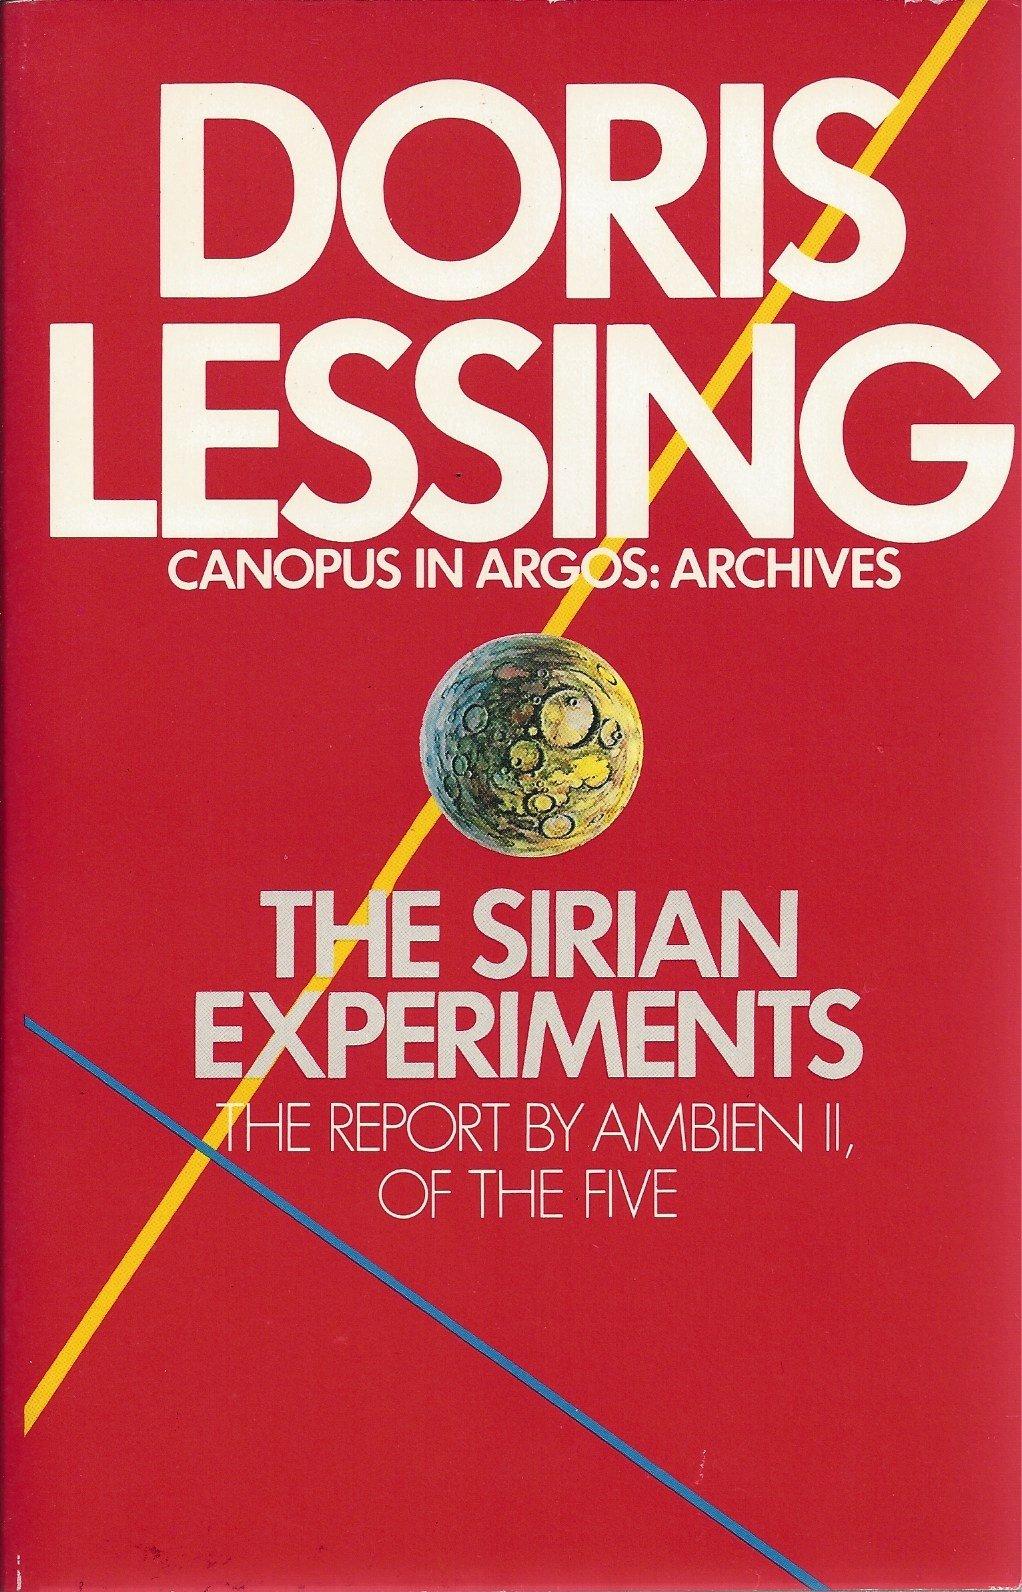 SIRIAN EXPERIMNTS V195, Lessing, Doris